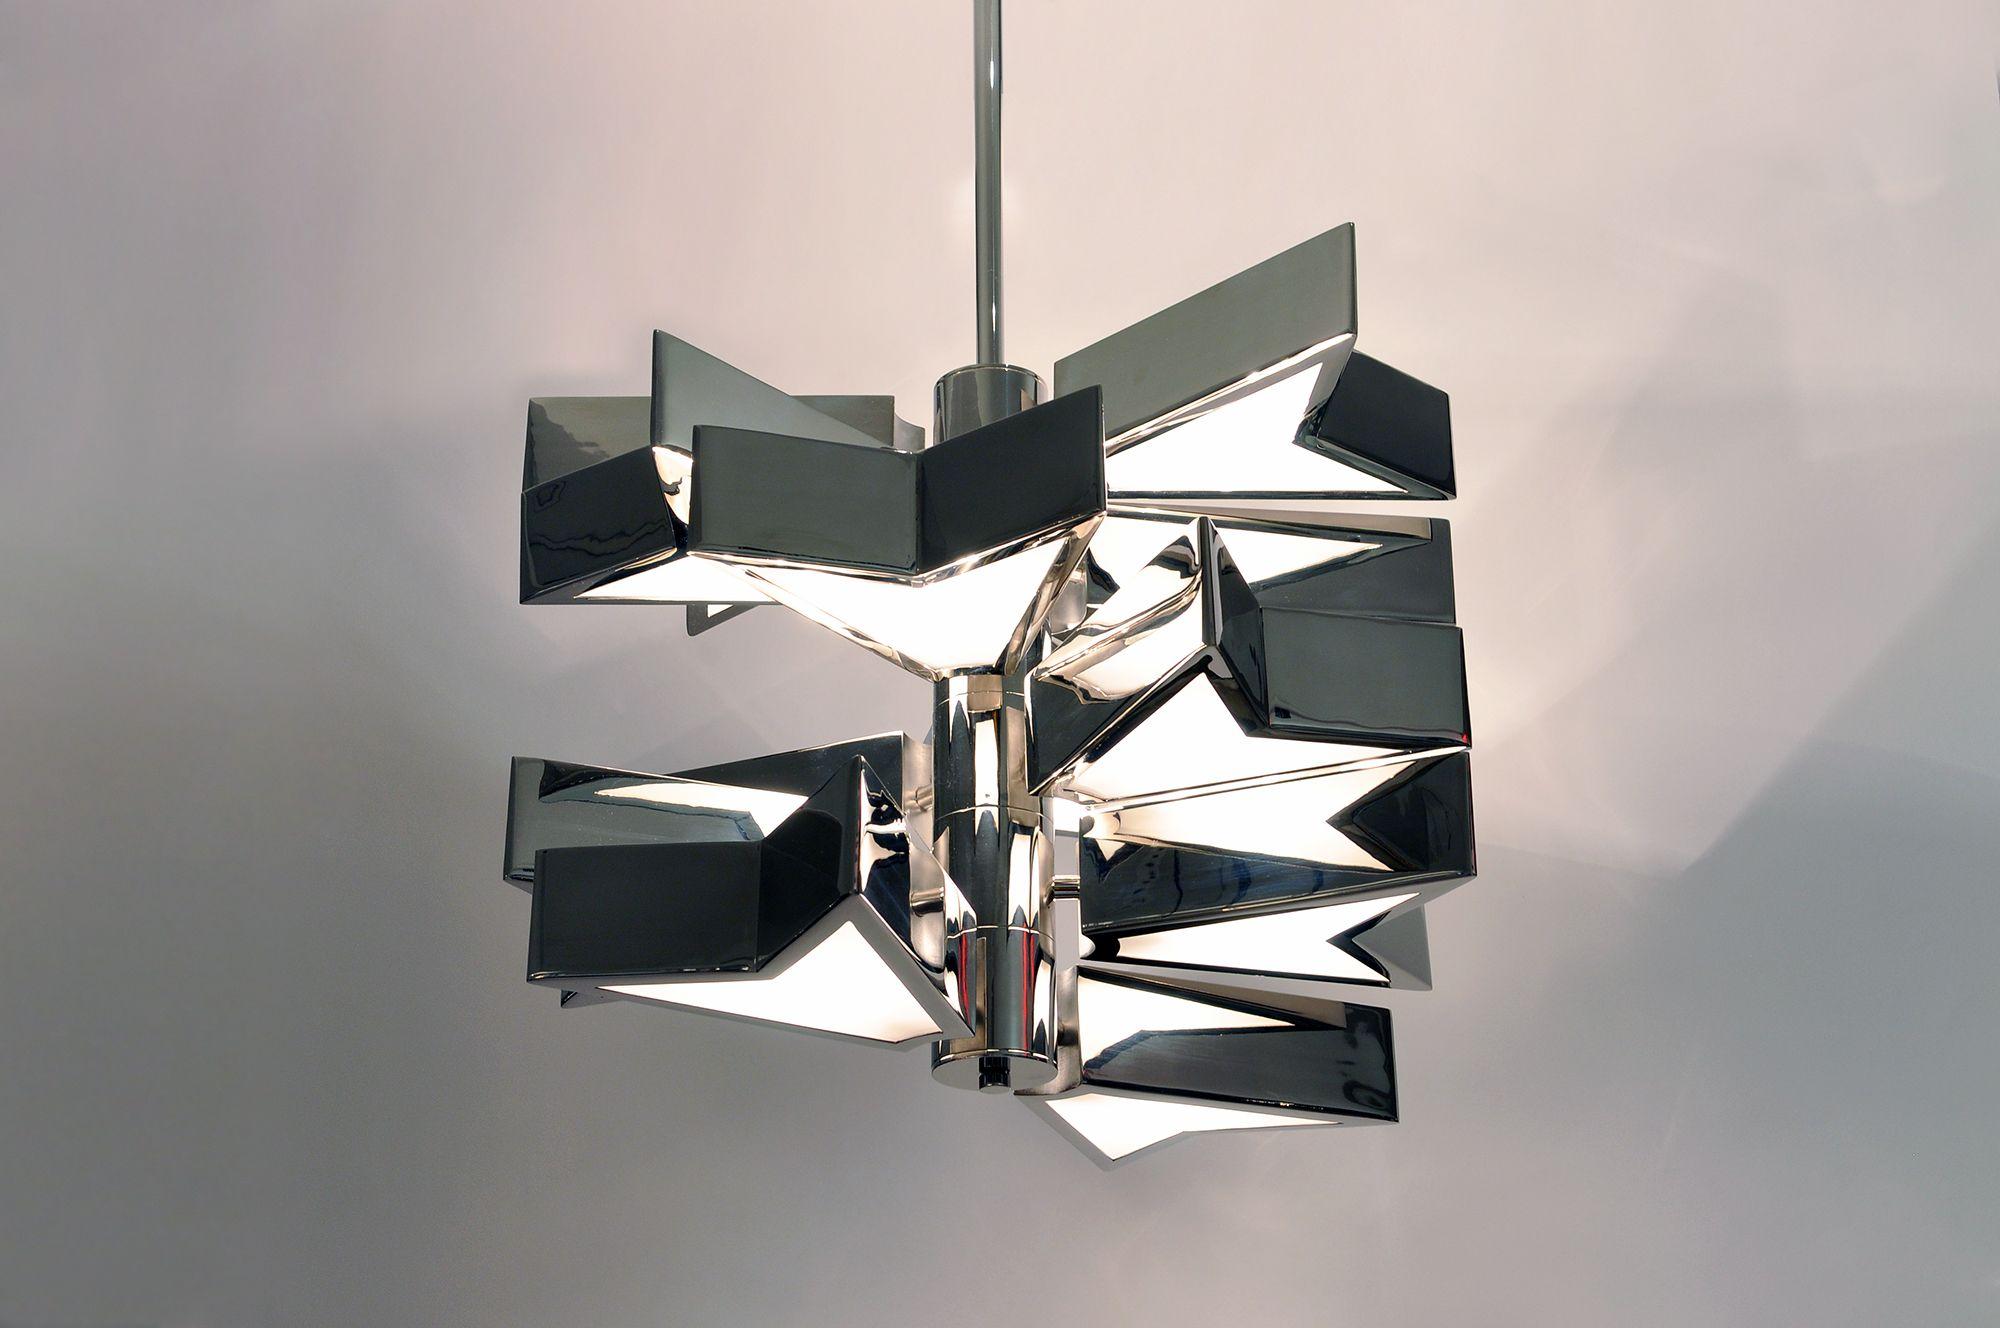 Osiris Chandelier | Matthew Fairbank Design #lighting #lightingdesign #bespoke #madeinbrooklyn #madeinnyc #interiordesign #design